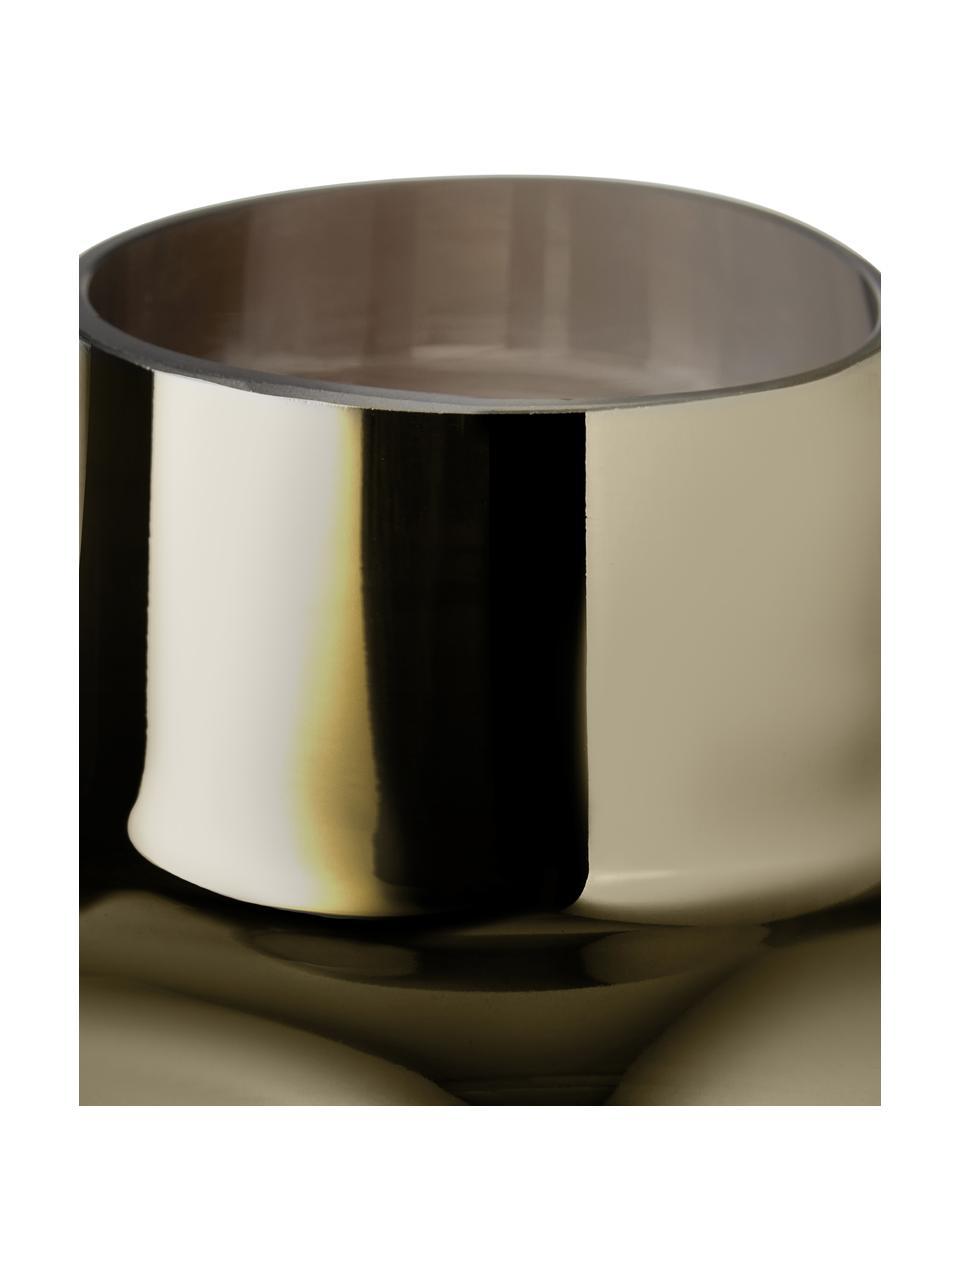 Vaso decorativo in vetro soffiato Uma, Vetro, Trasparente, dorato, Ø 16 x Alt. 27 cm